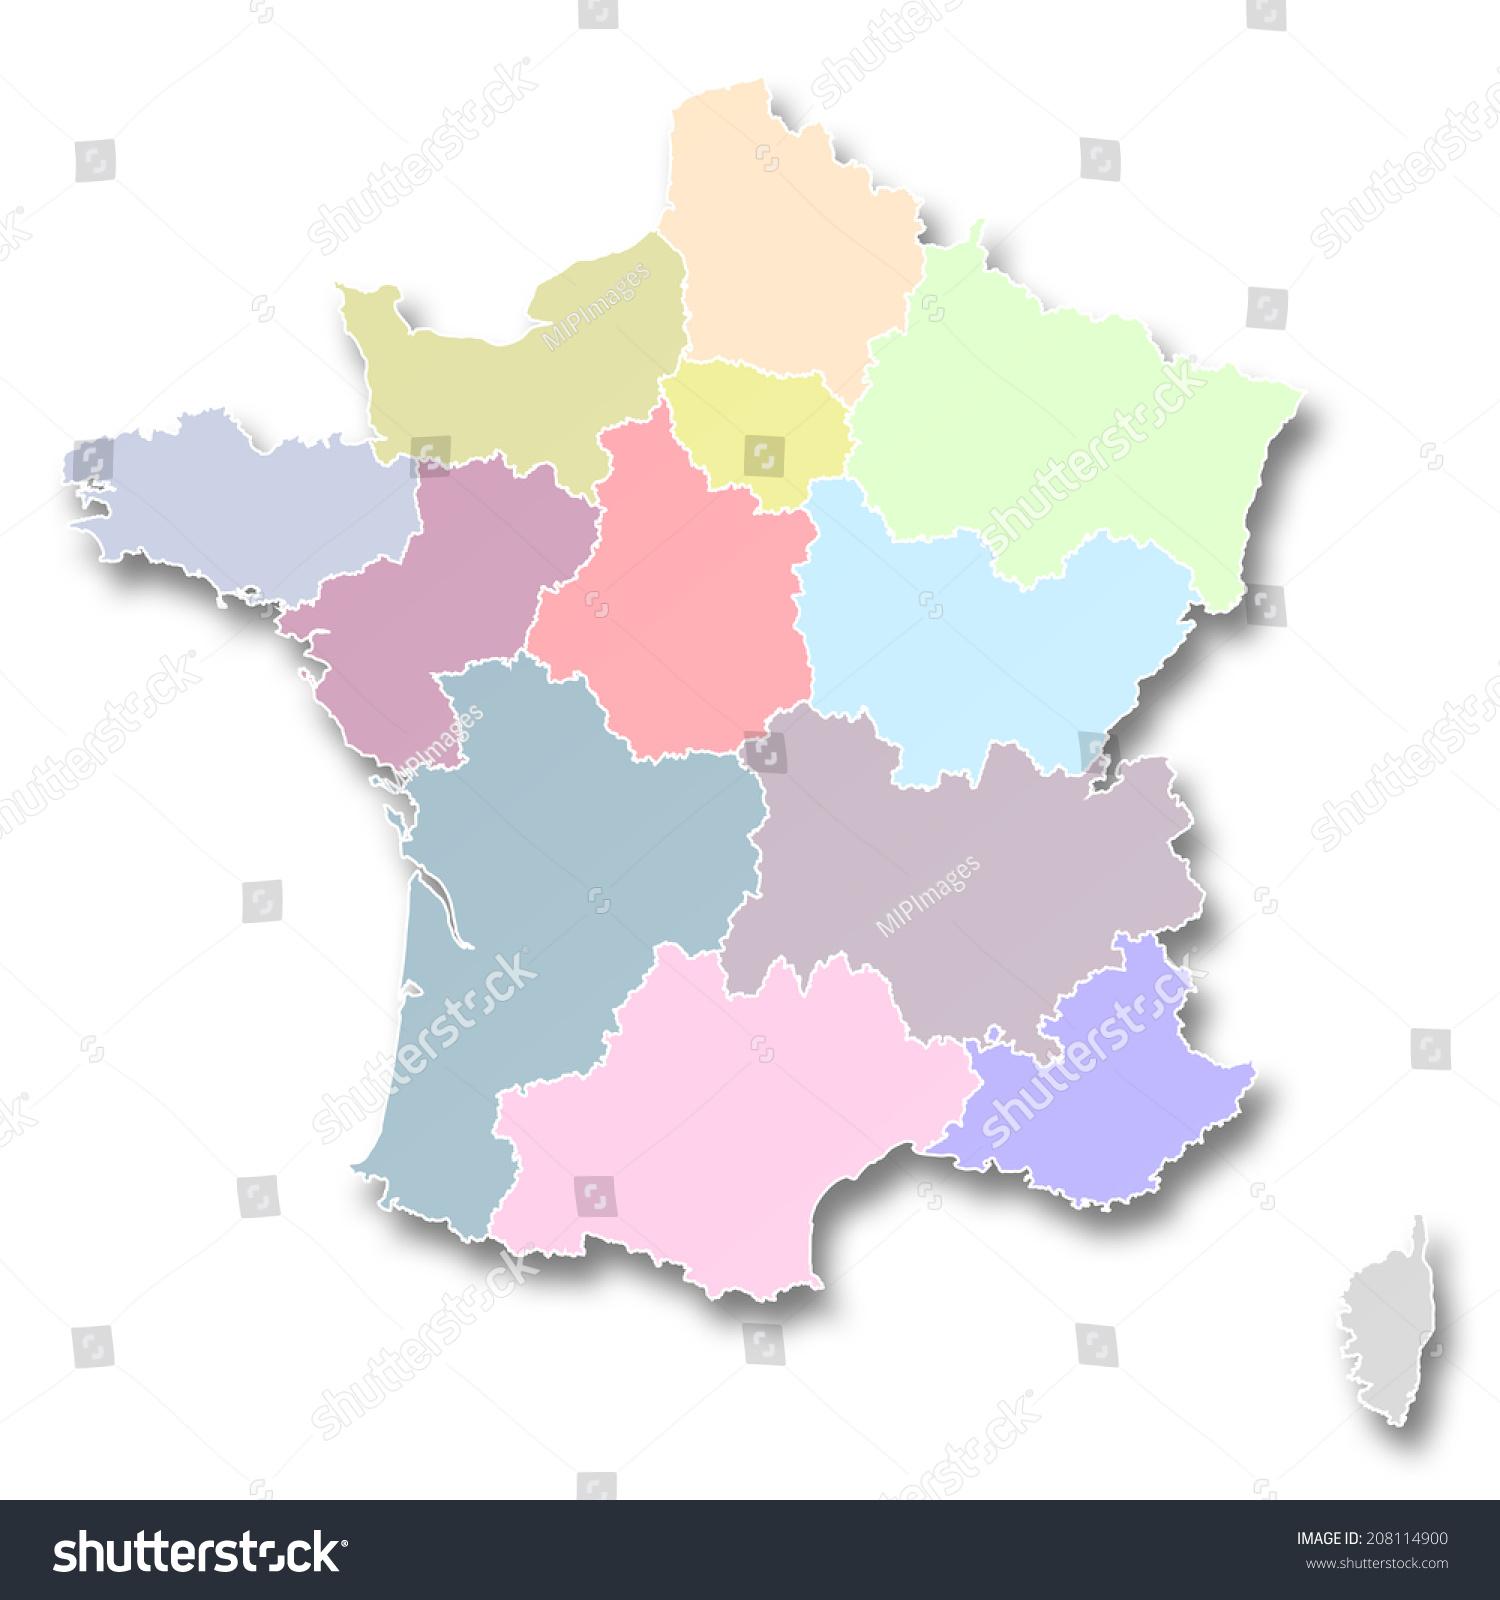 Regions Of Canada Map%0A map of france regions map new regions france stock illustration            shutterstock